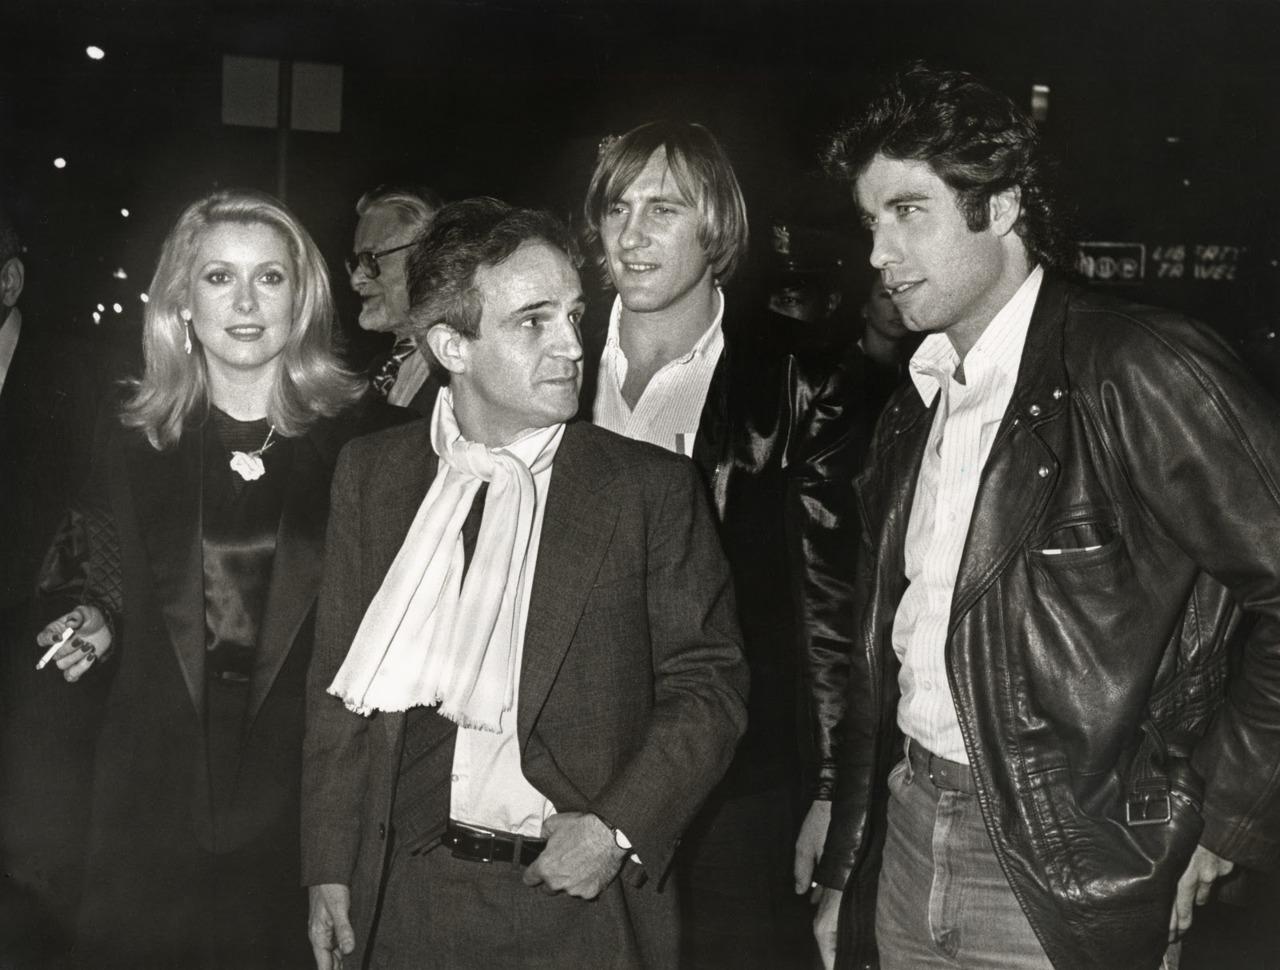 Catherine Deneuve, Francois Truffaut, Gerard Depardieu, and JohnTravolta